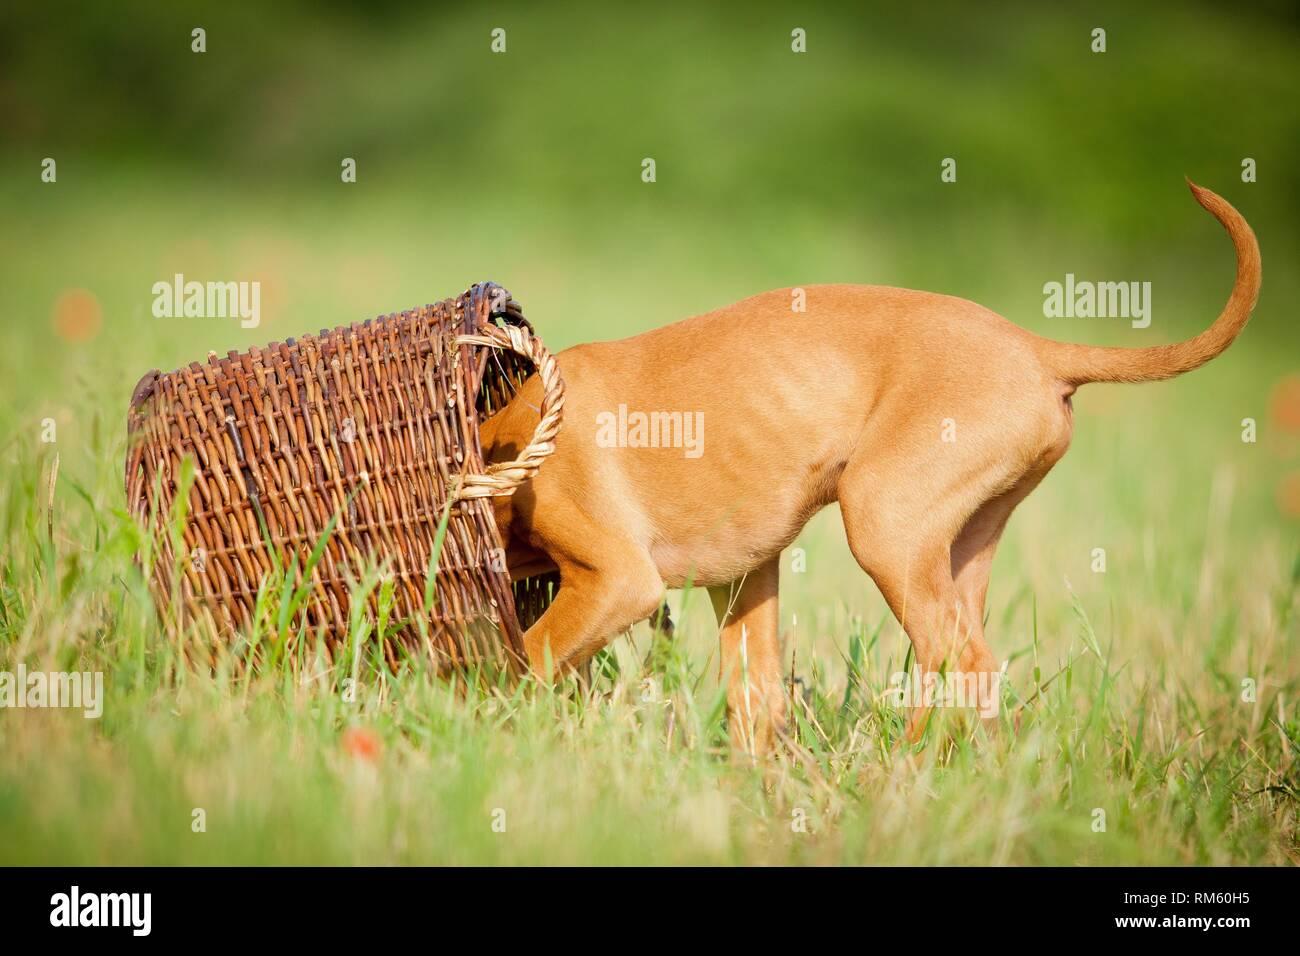 Magyar Vizsla Puppy - Stock Image